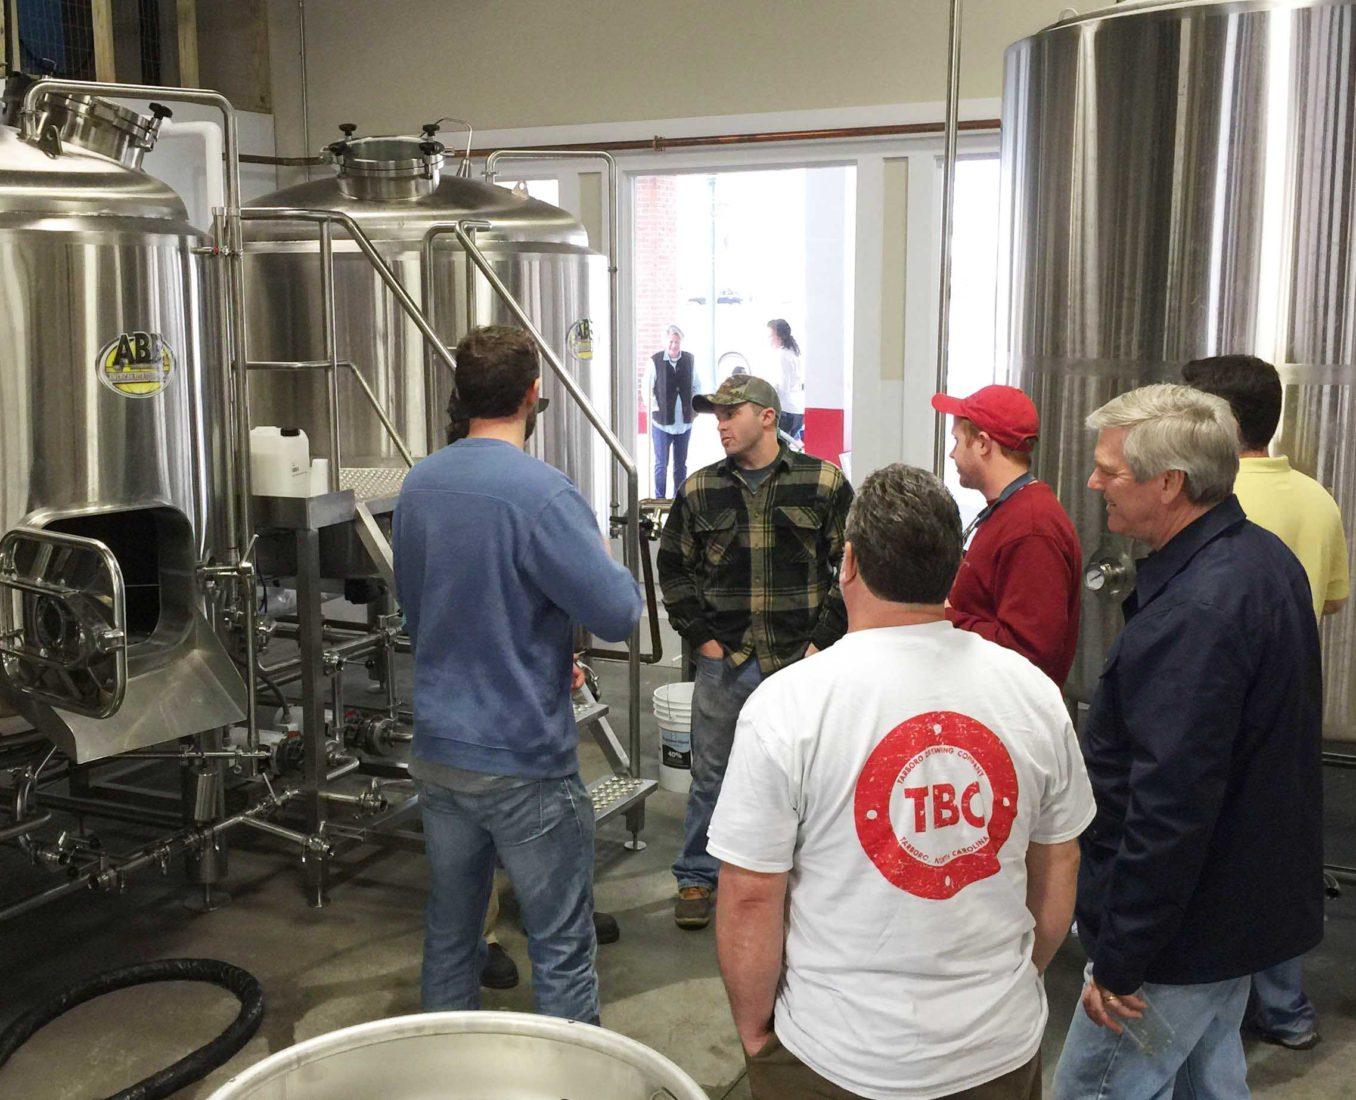 269. Tarboro Brewing Company, Tarboro NC, 2016